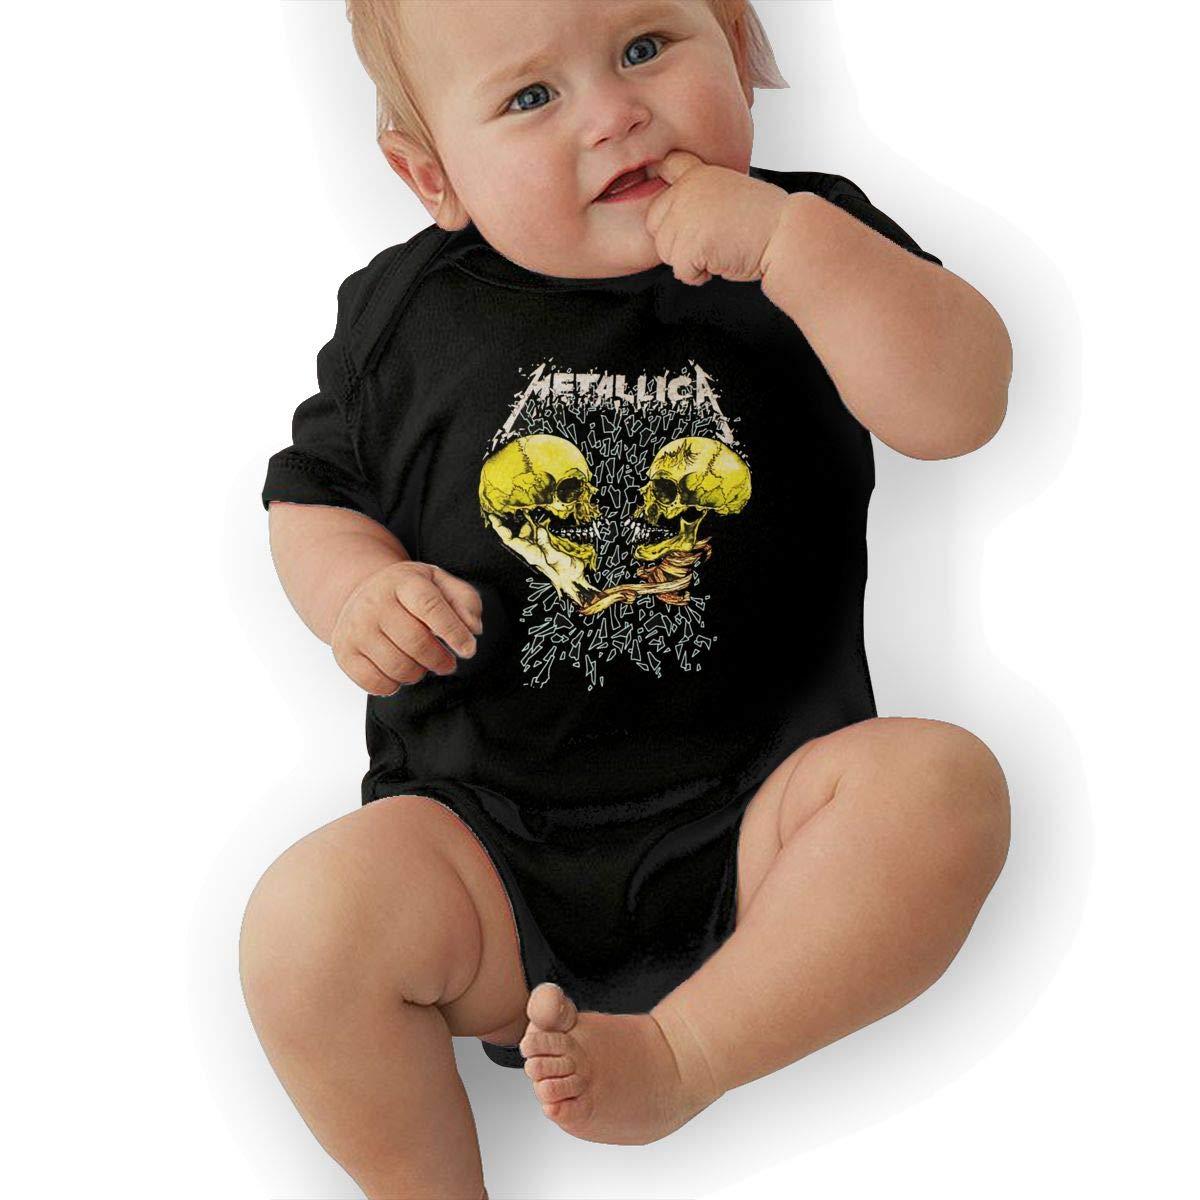 LuckyTagy Metallica Unisex Fashion Toddler Romper Baby BoyBodysuit Black